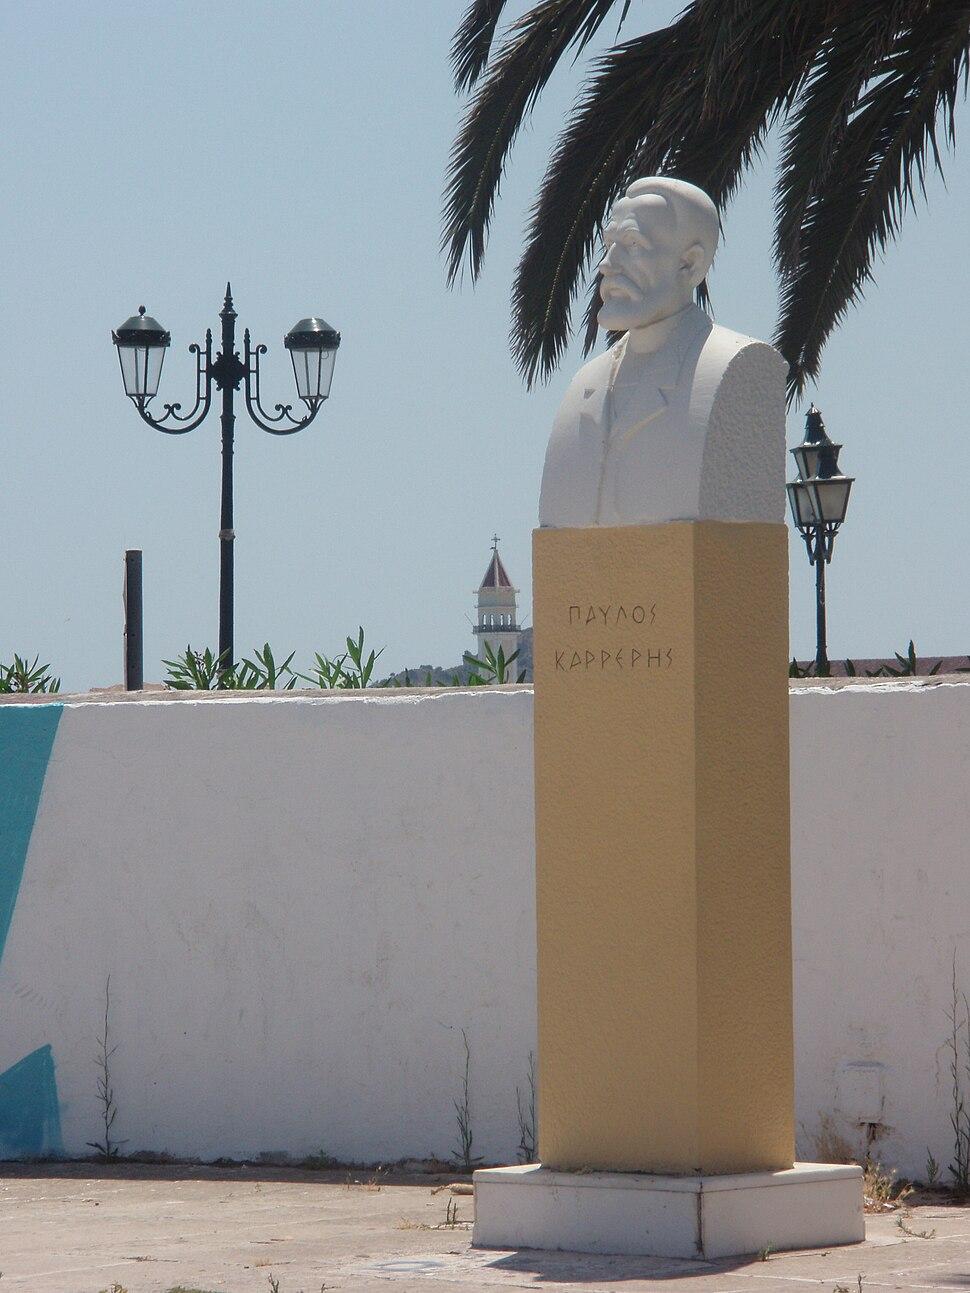 Pavlos Karreris (Paul Carrer) statue, Zakynthos City, Greece 01